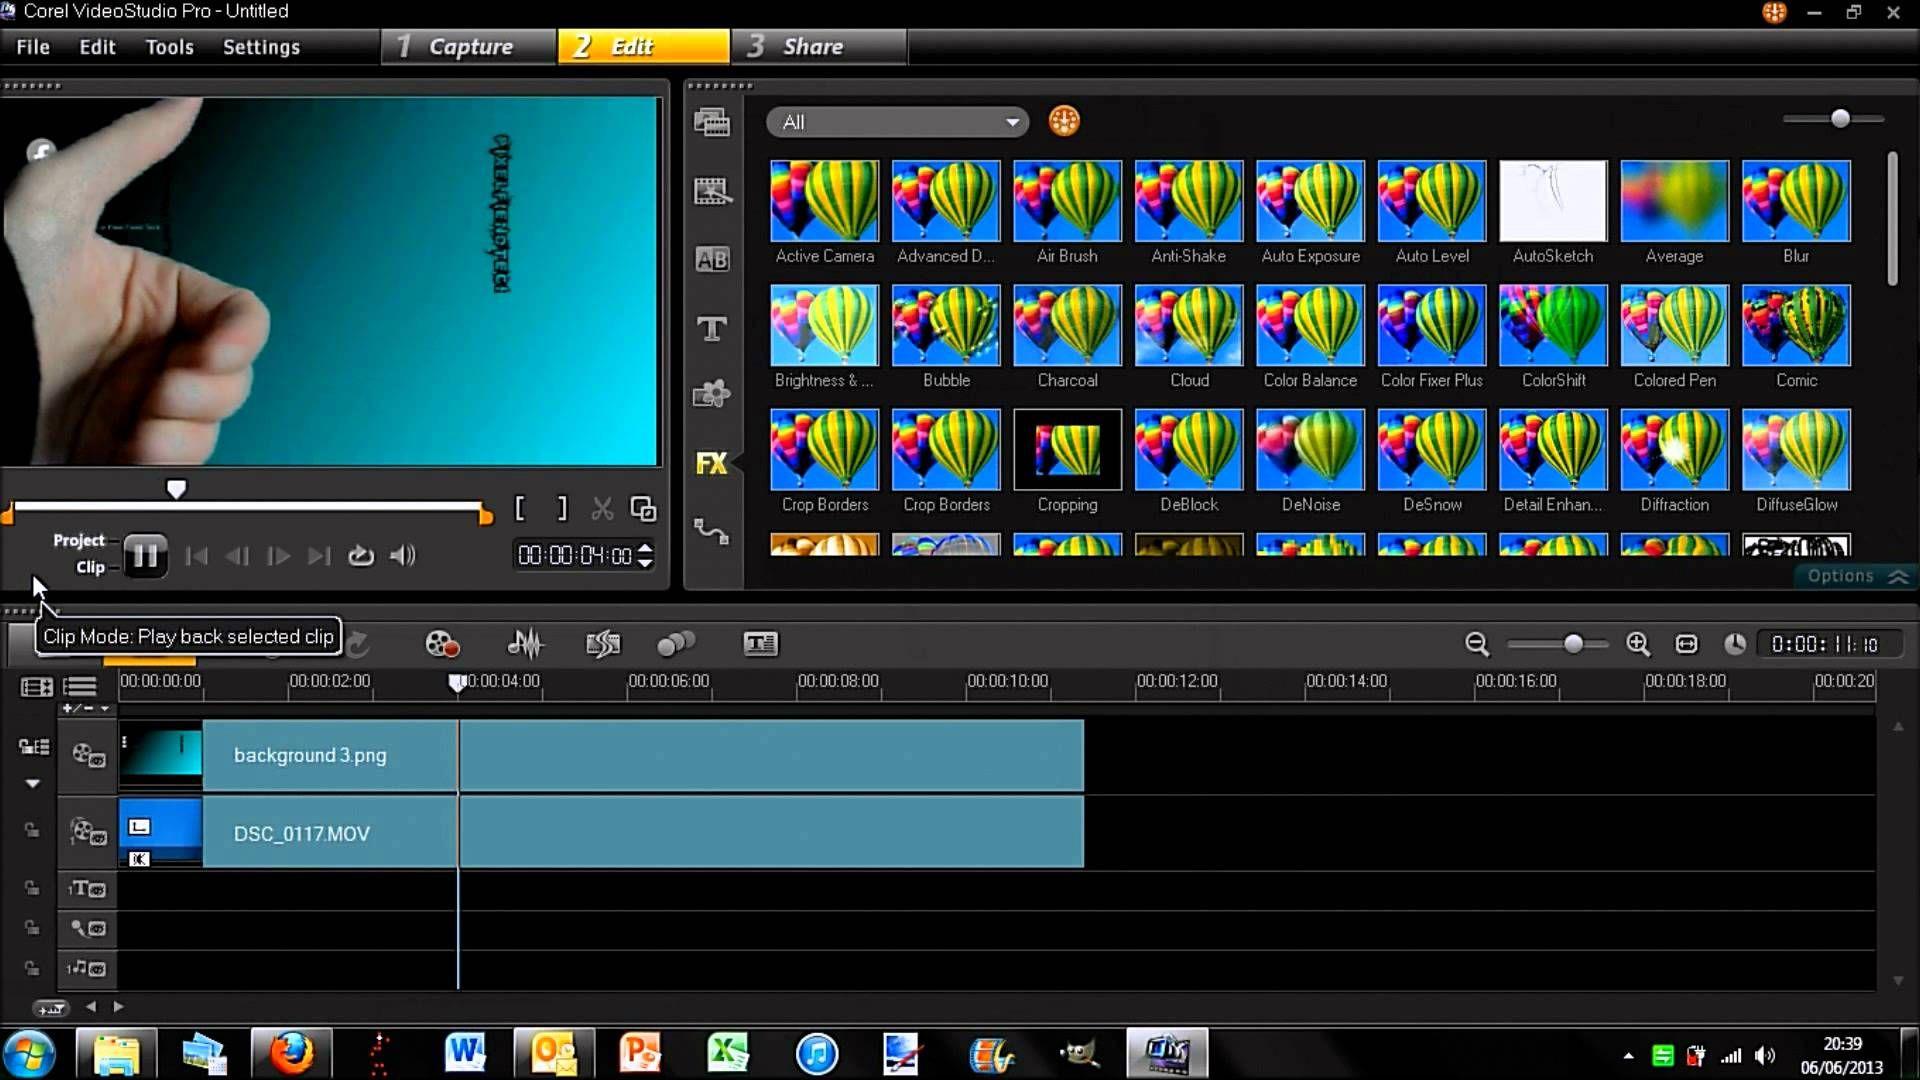 Corel Video Studio Templates Free Download